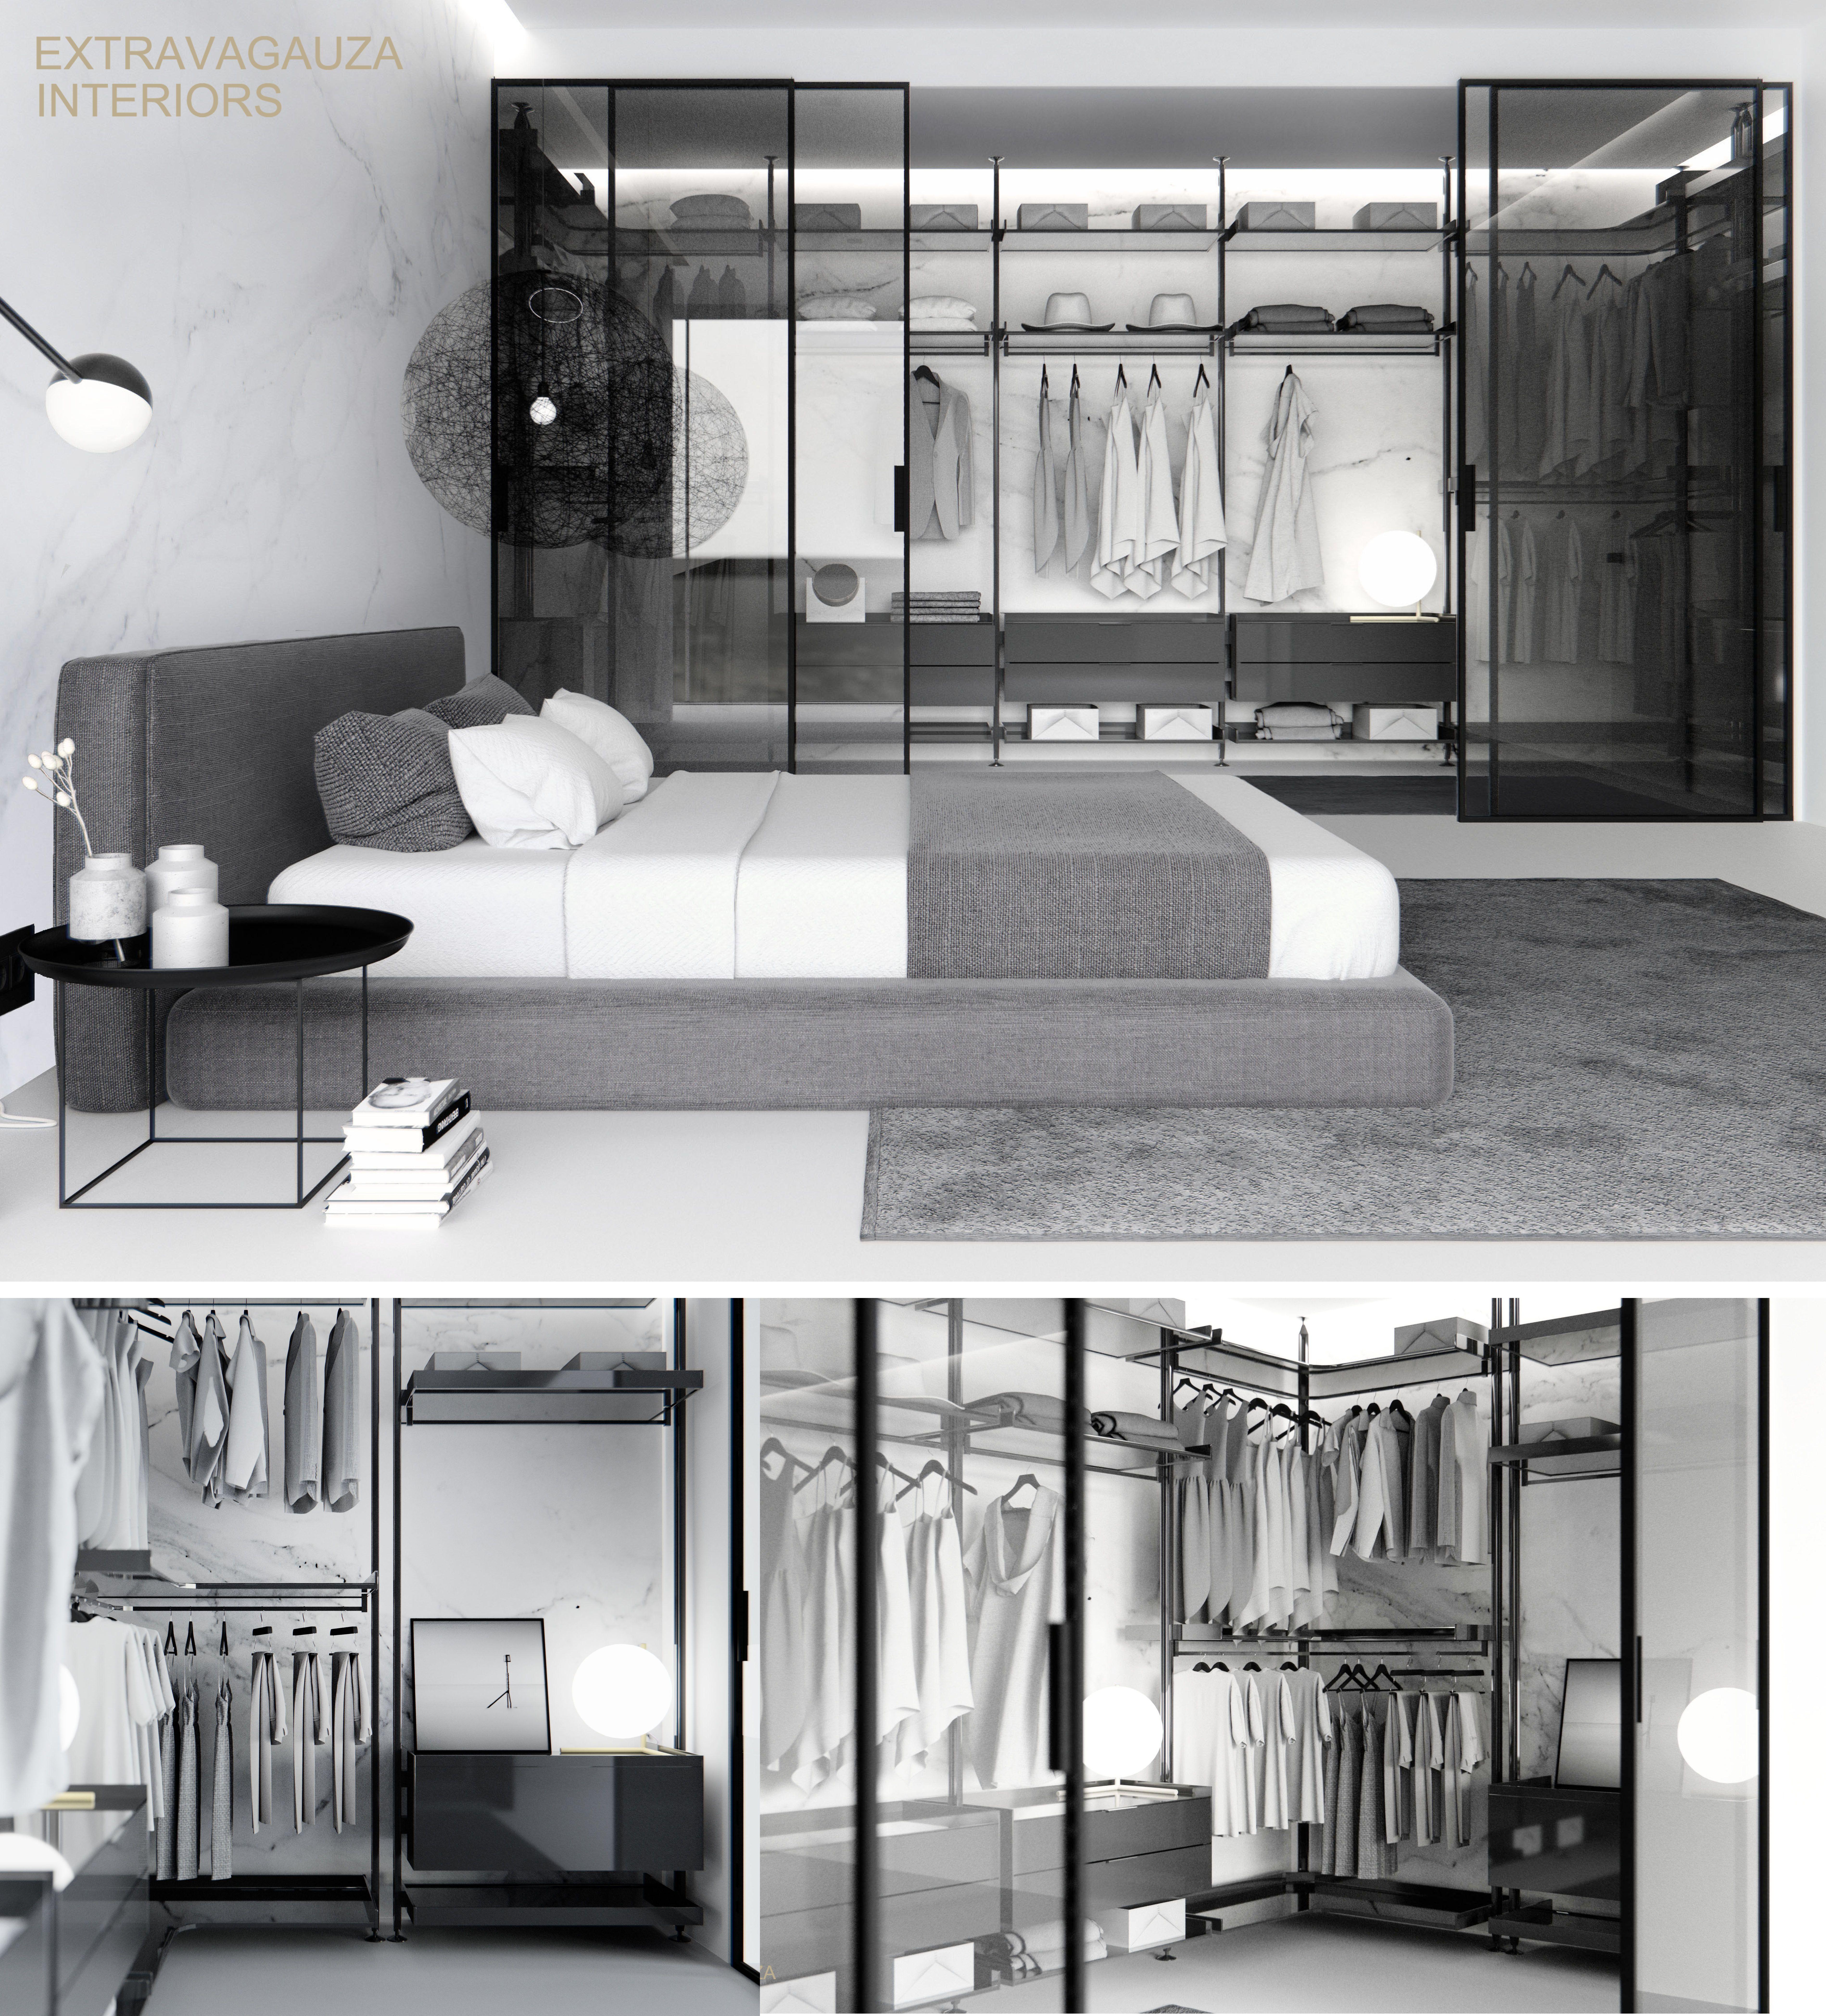 Fabulous Minimalist Furniture For Interior Home Design: Contemporary Minimalist Bedroom